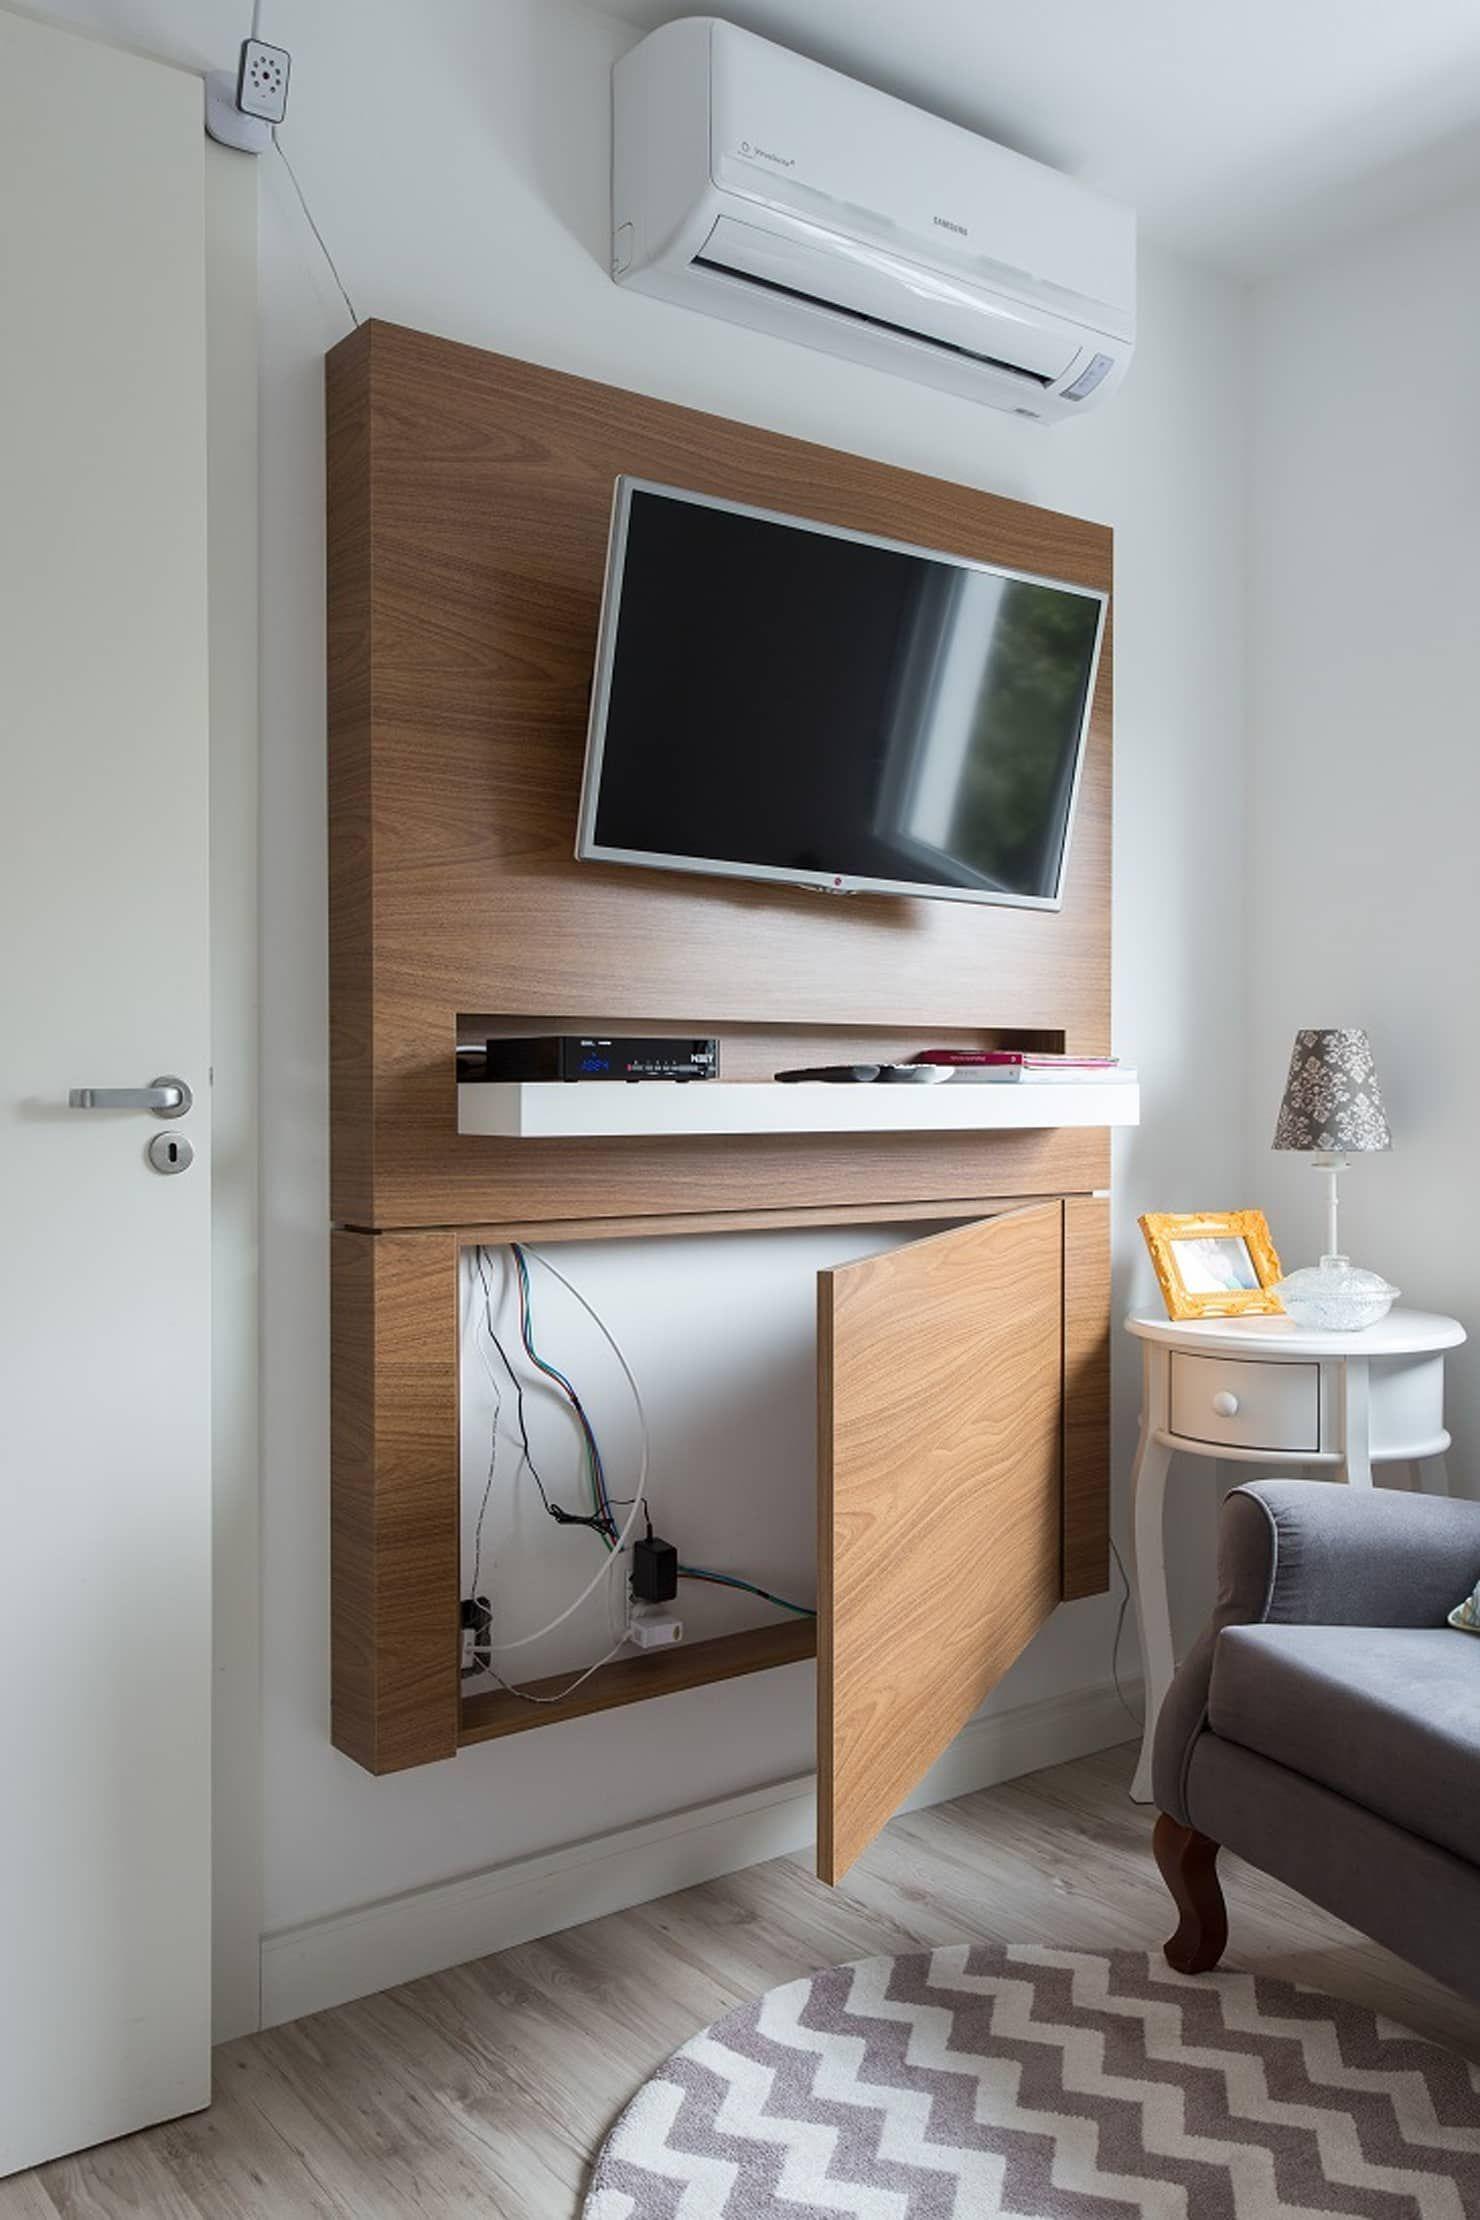 Dormitorios de estilo por kali arquitetura, moderno